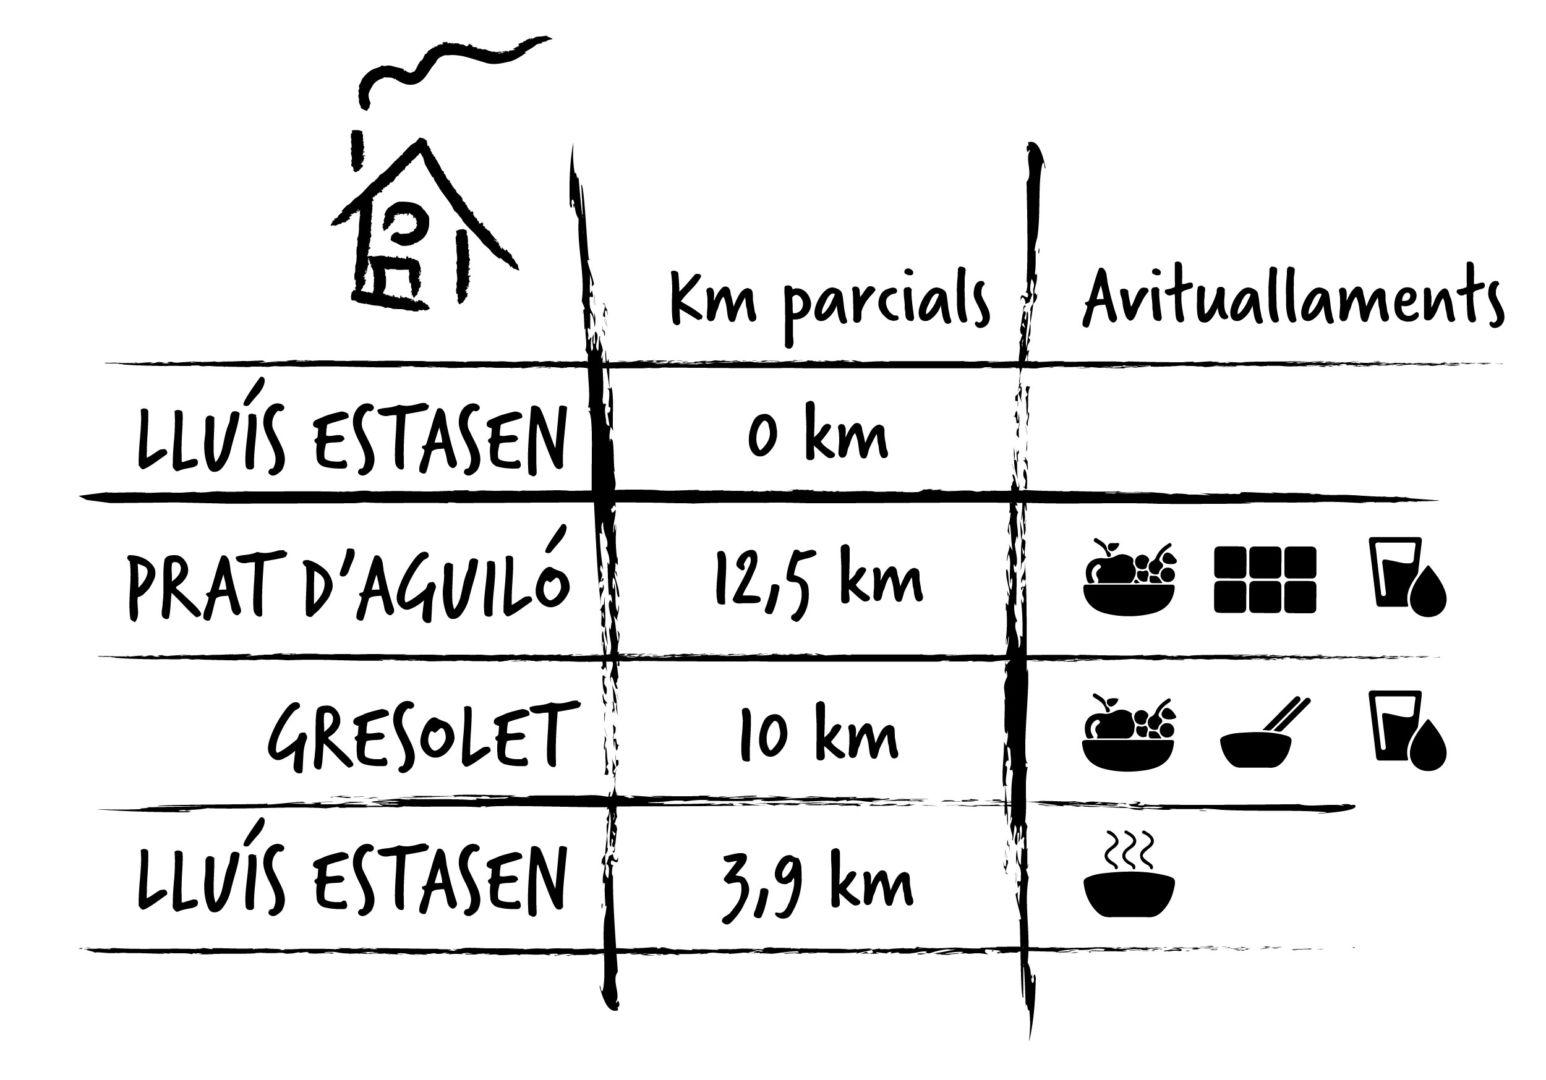 Avituallamiento TAST: Lluis Estasen 0KM, Prats d'Aguiló 12.5Km, Gresolet 10Km, Lluis Estasen 3.9Km